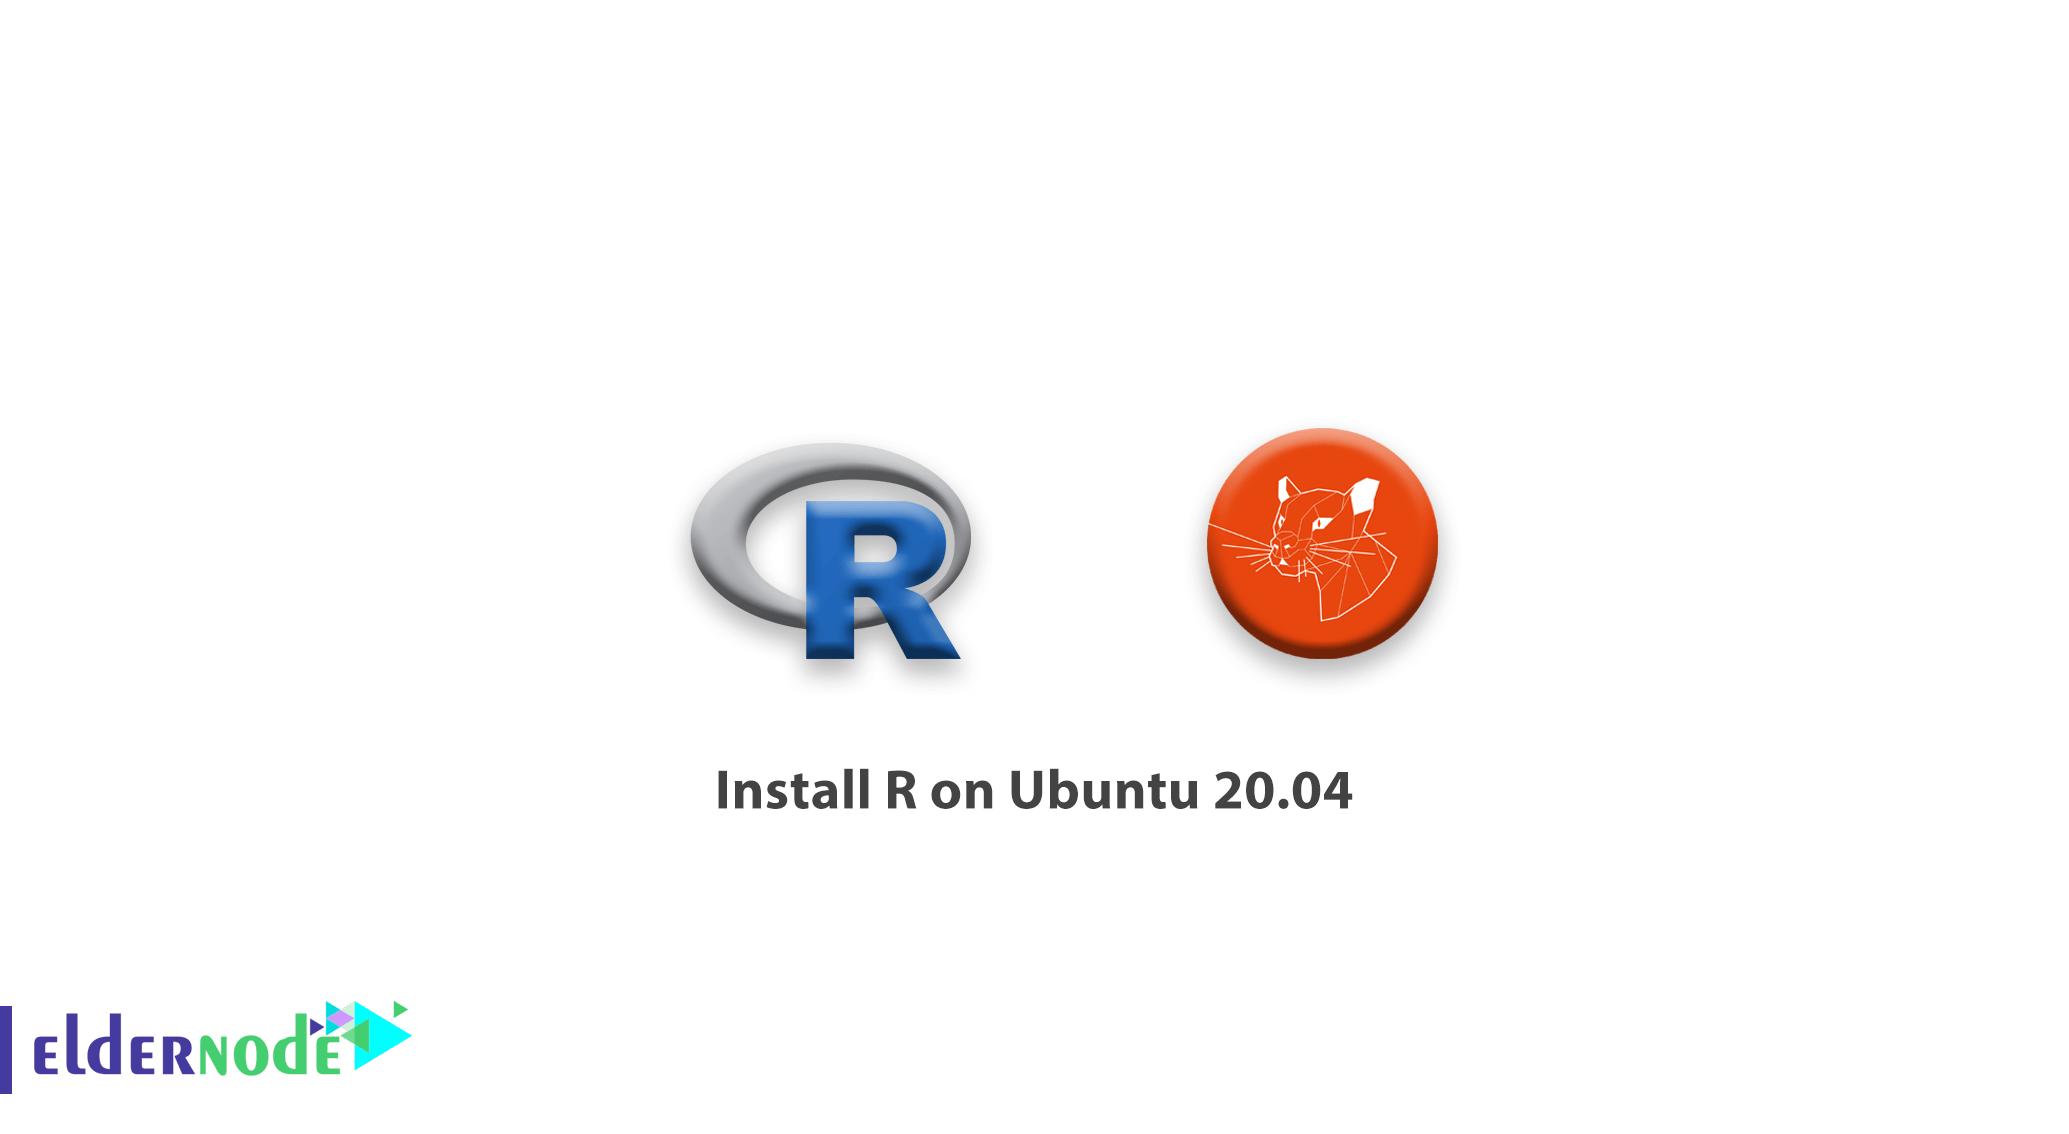 How to install R on Ubuntu 20.04